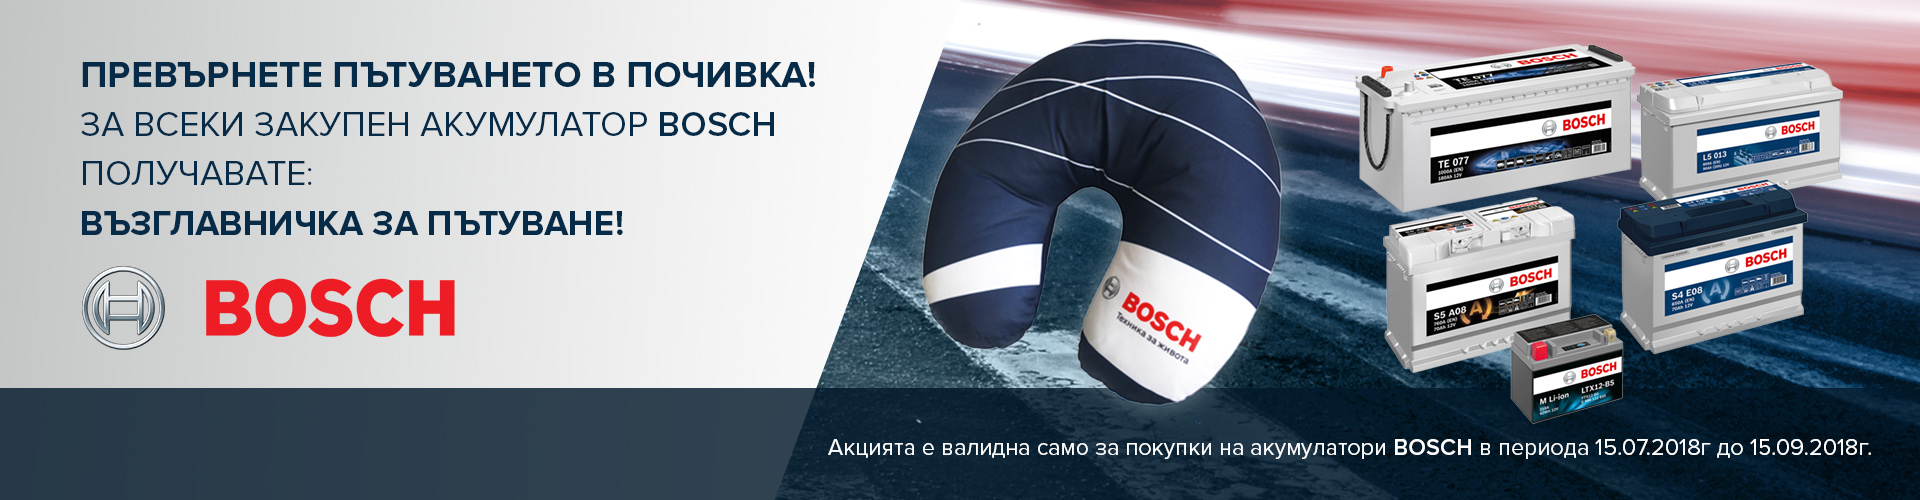 promo_bosch_batteries_15-07-2018_-_15-09-2018_banner.jpg